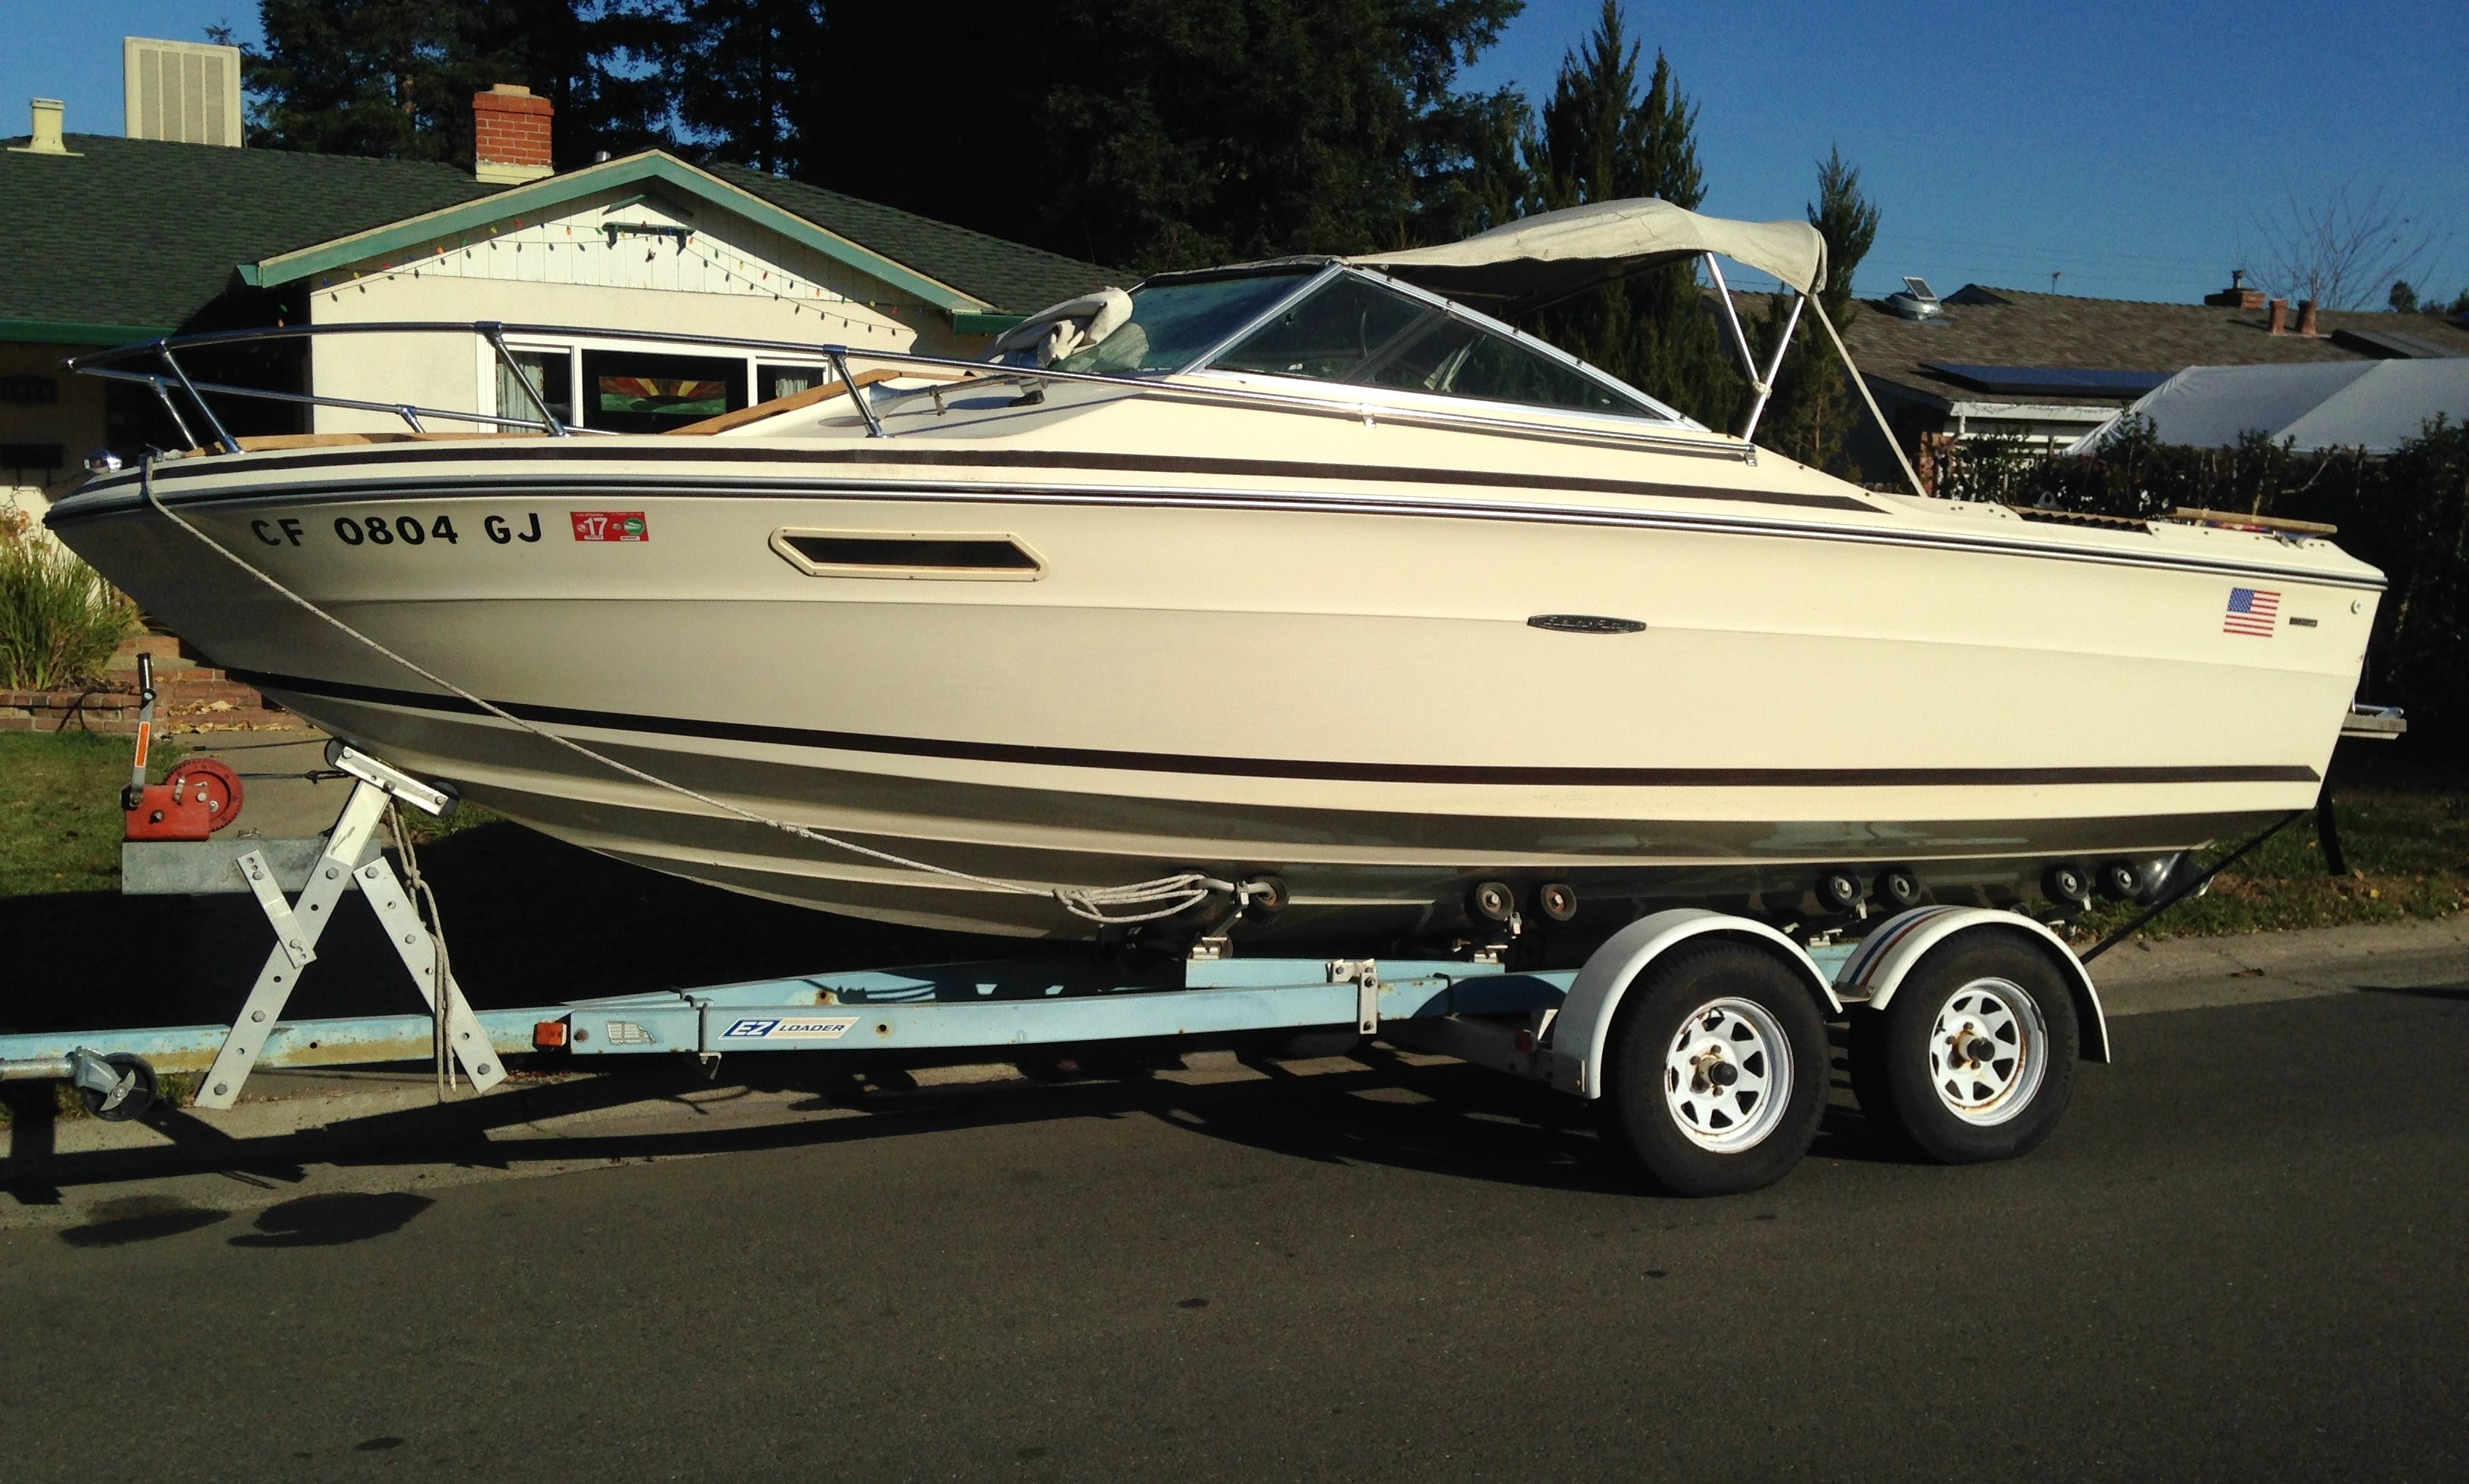 20' Sea Ray SRV 200 Bowrider Rental In Isleton, California